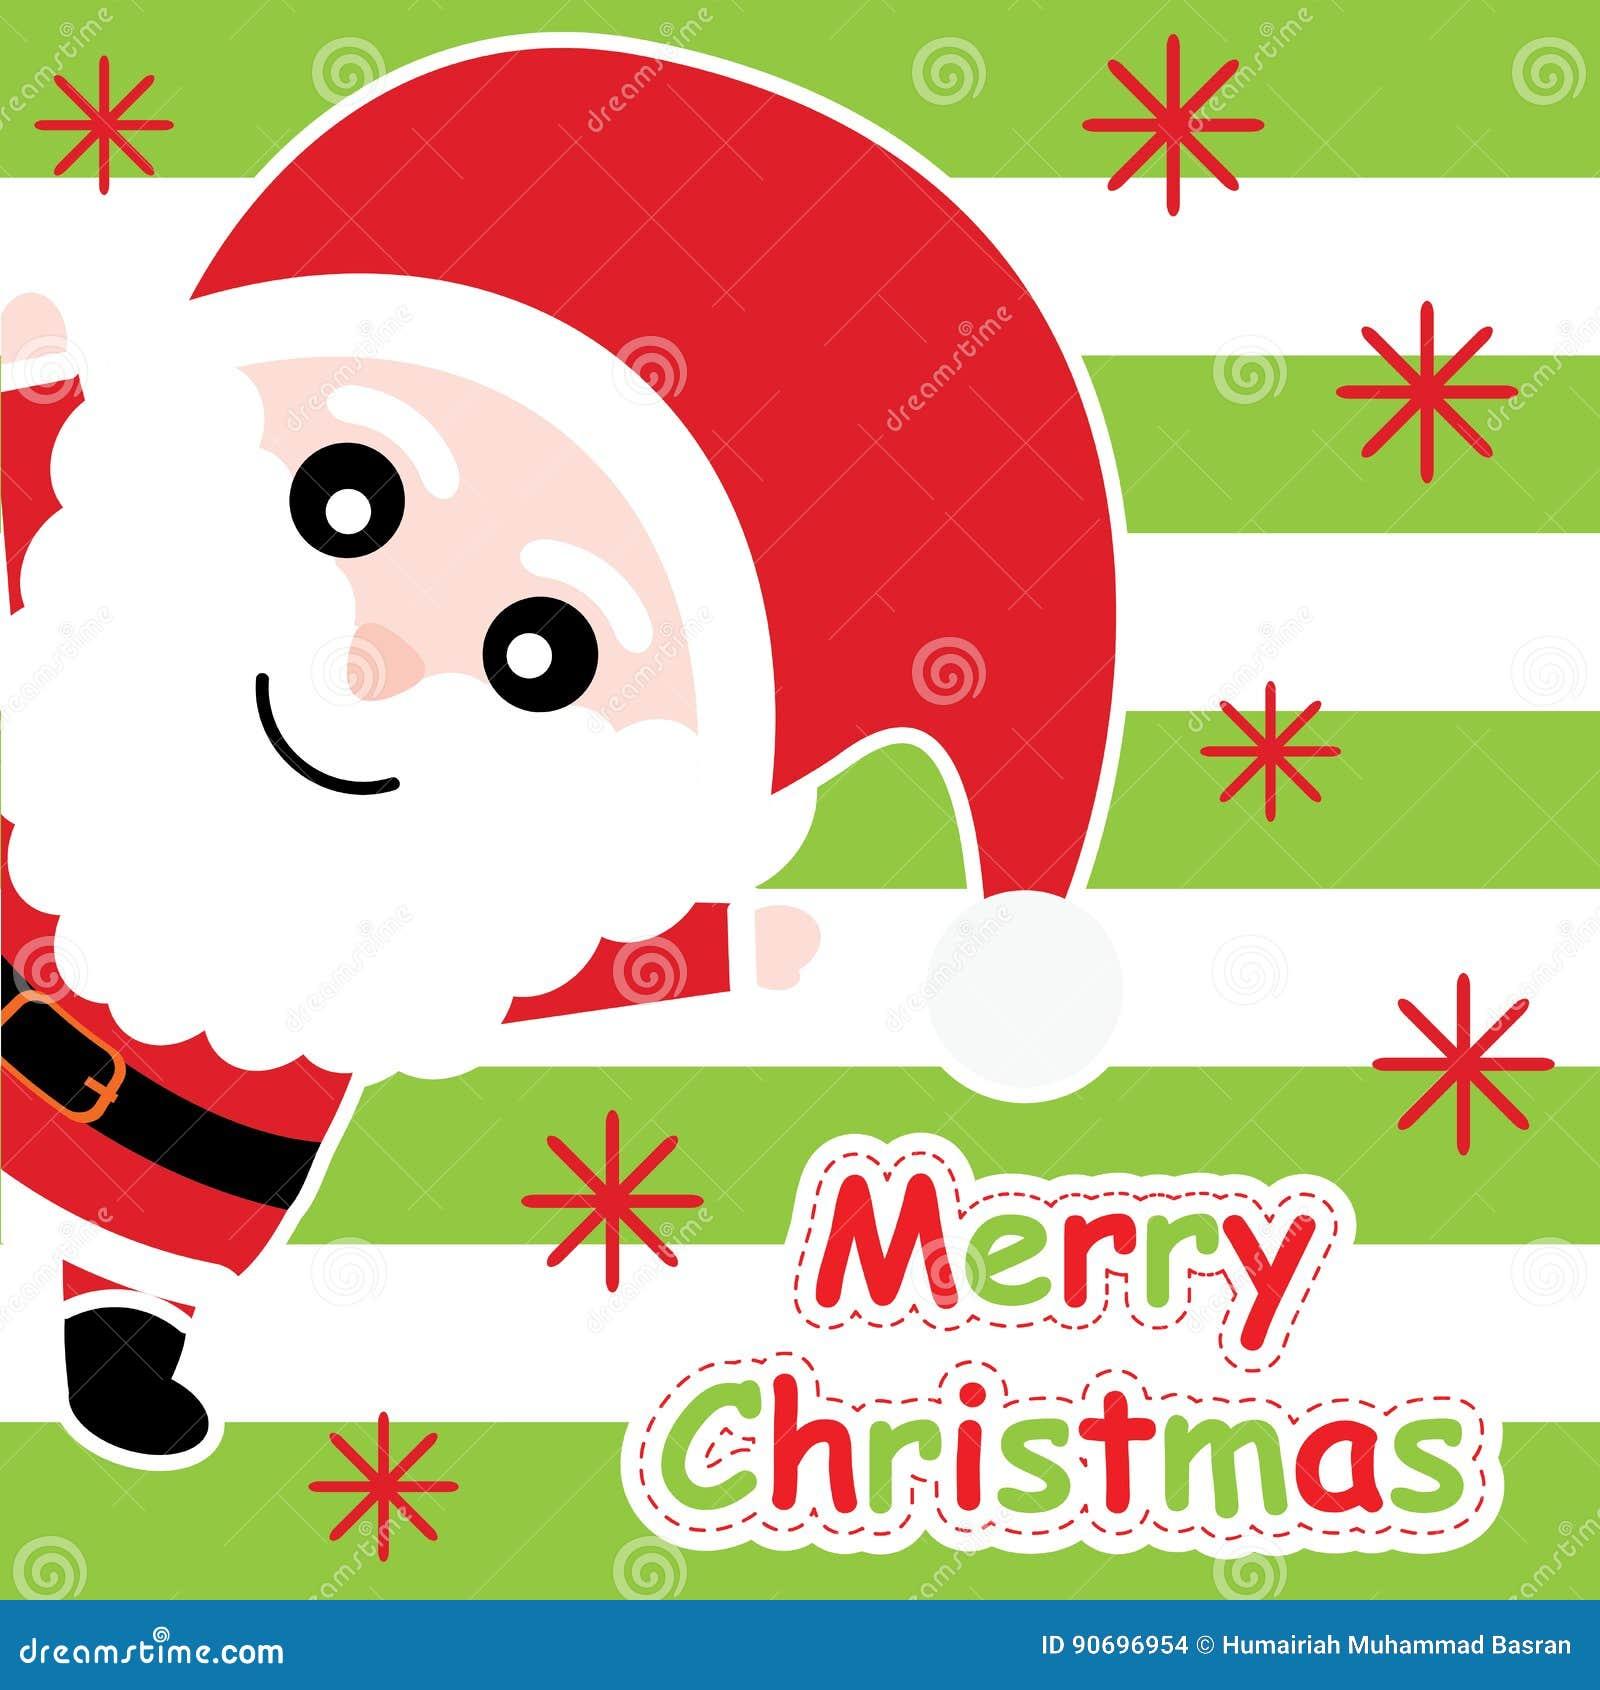 Xmas Card With Cute Santa Claus Cartoon On Green Striped